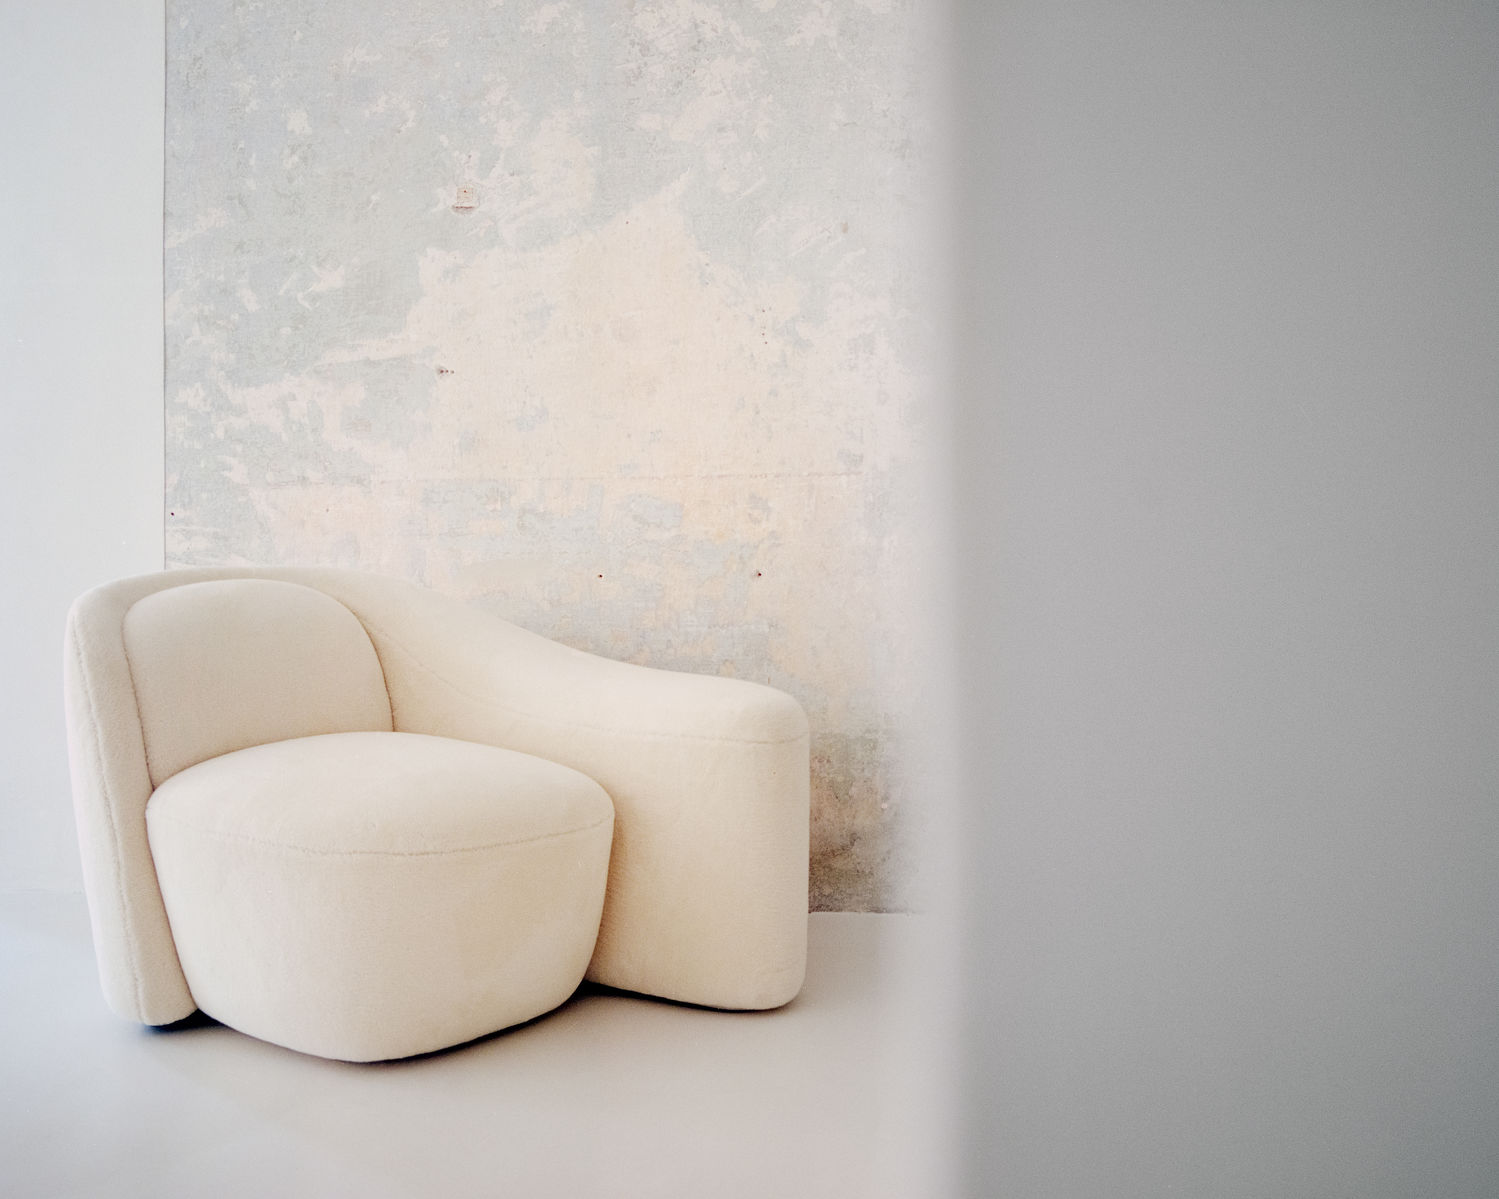 Loro Piana Interiors The Palm Duet Chaise Longue - THE EDGE SINGAPORE